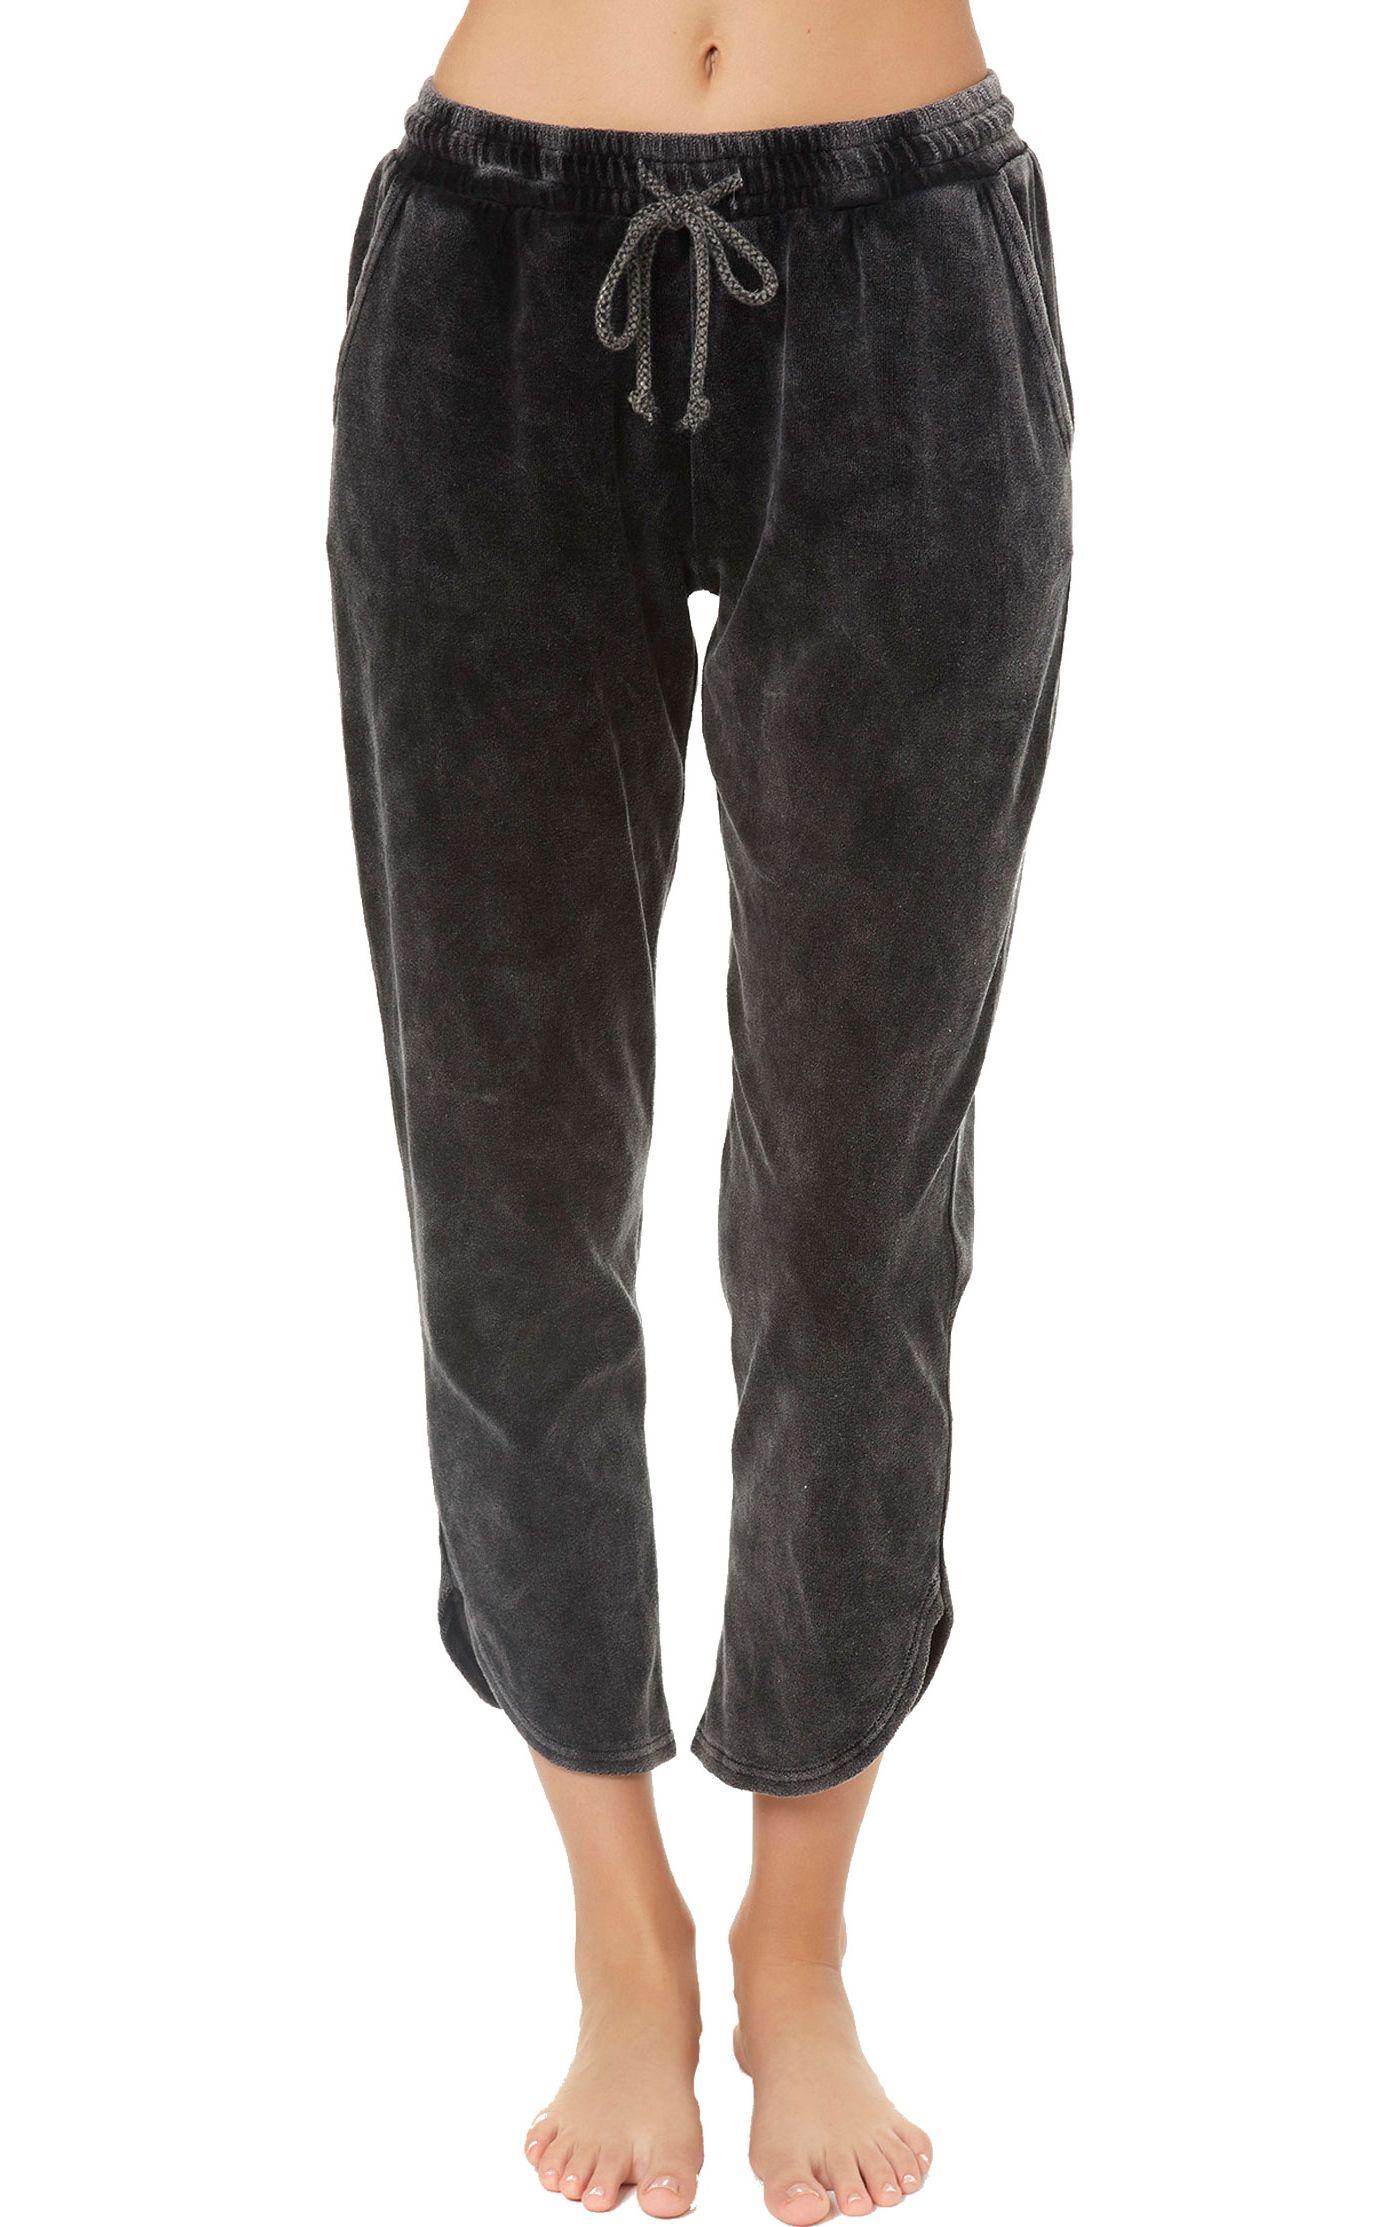 O'Neill Women's Ackerman Pants